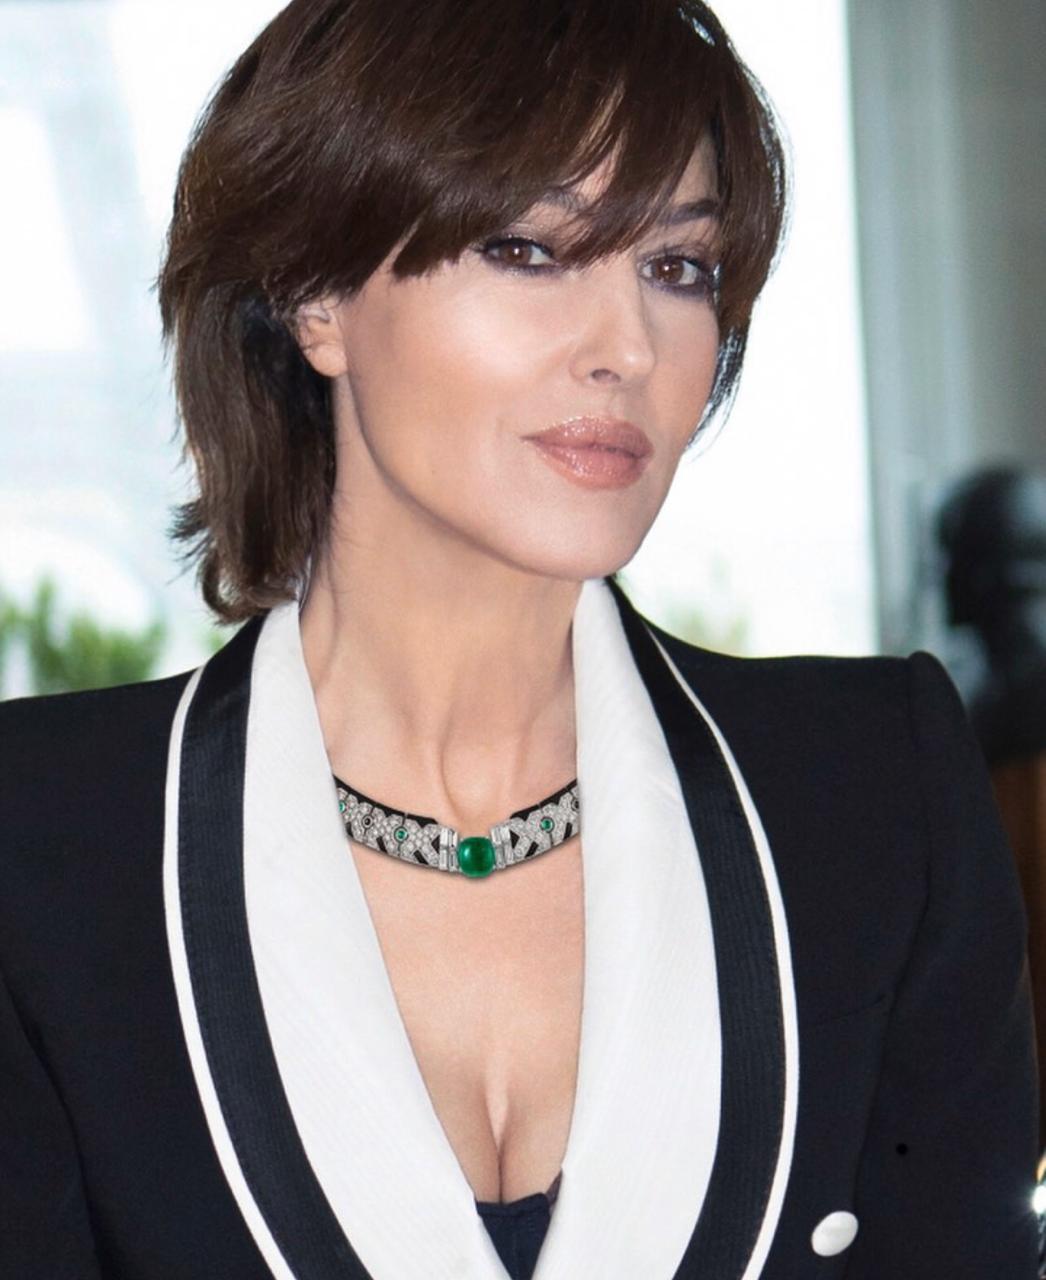 مونيكا بيلوتشي (9)